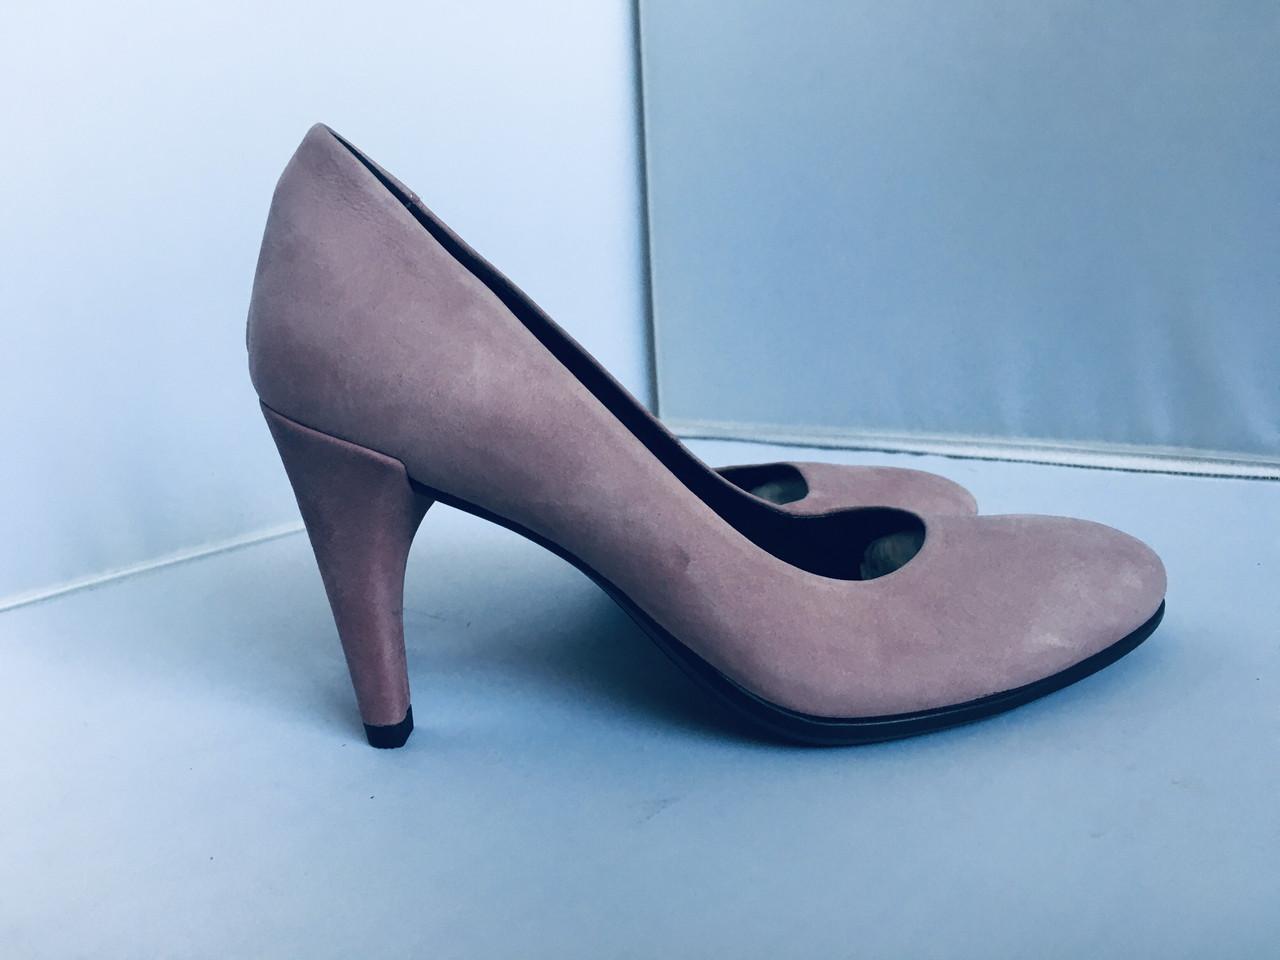 Женские туфли Ecco, 35 размер